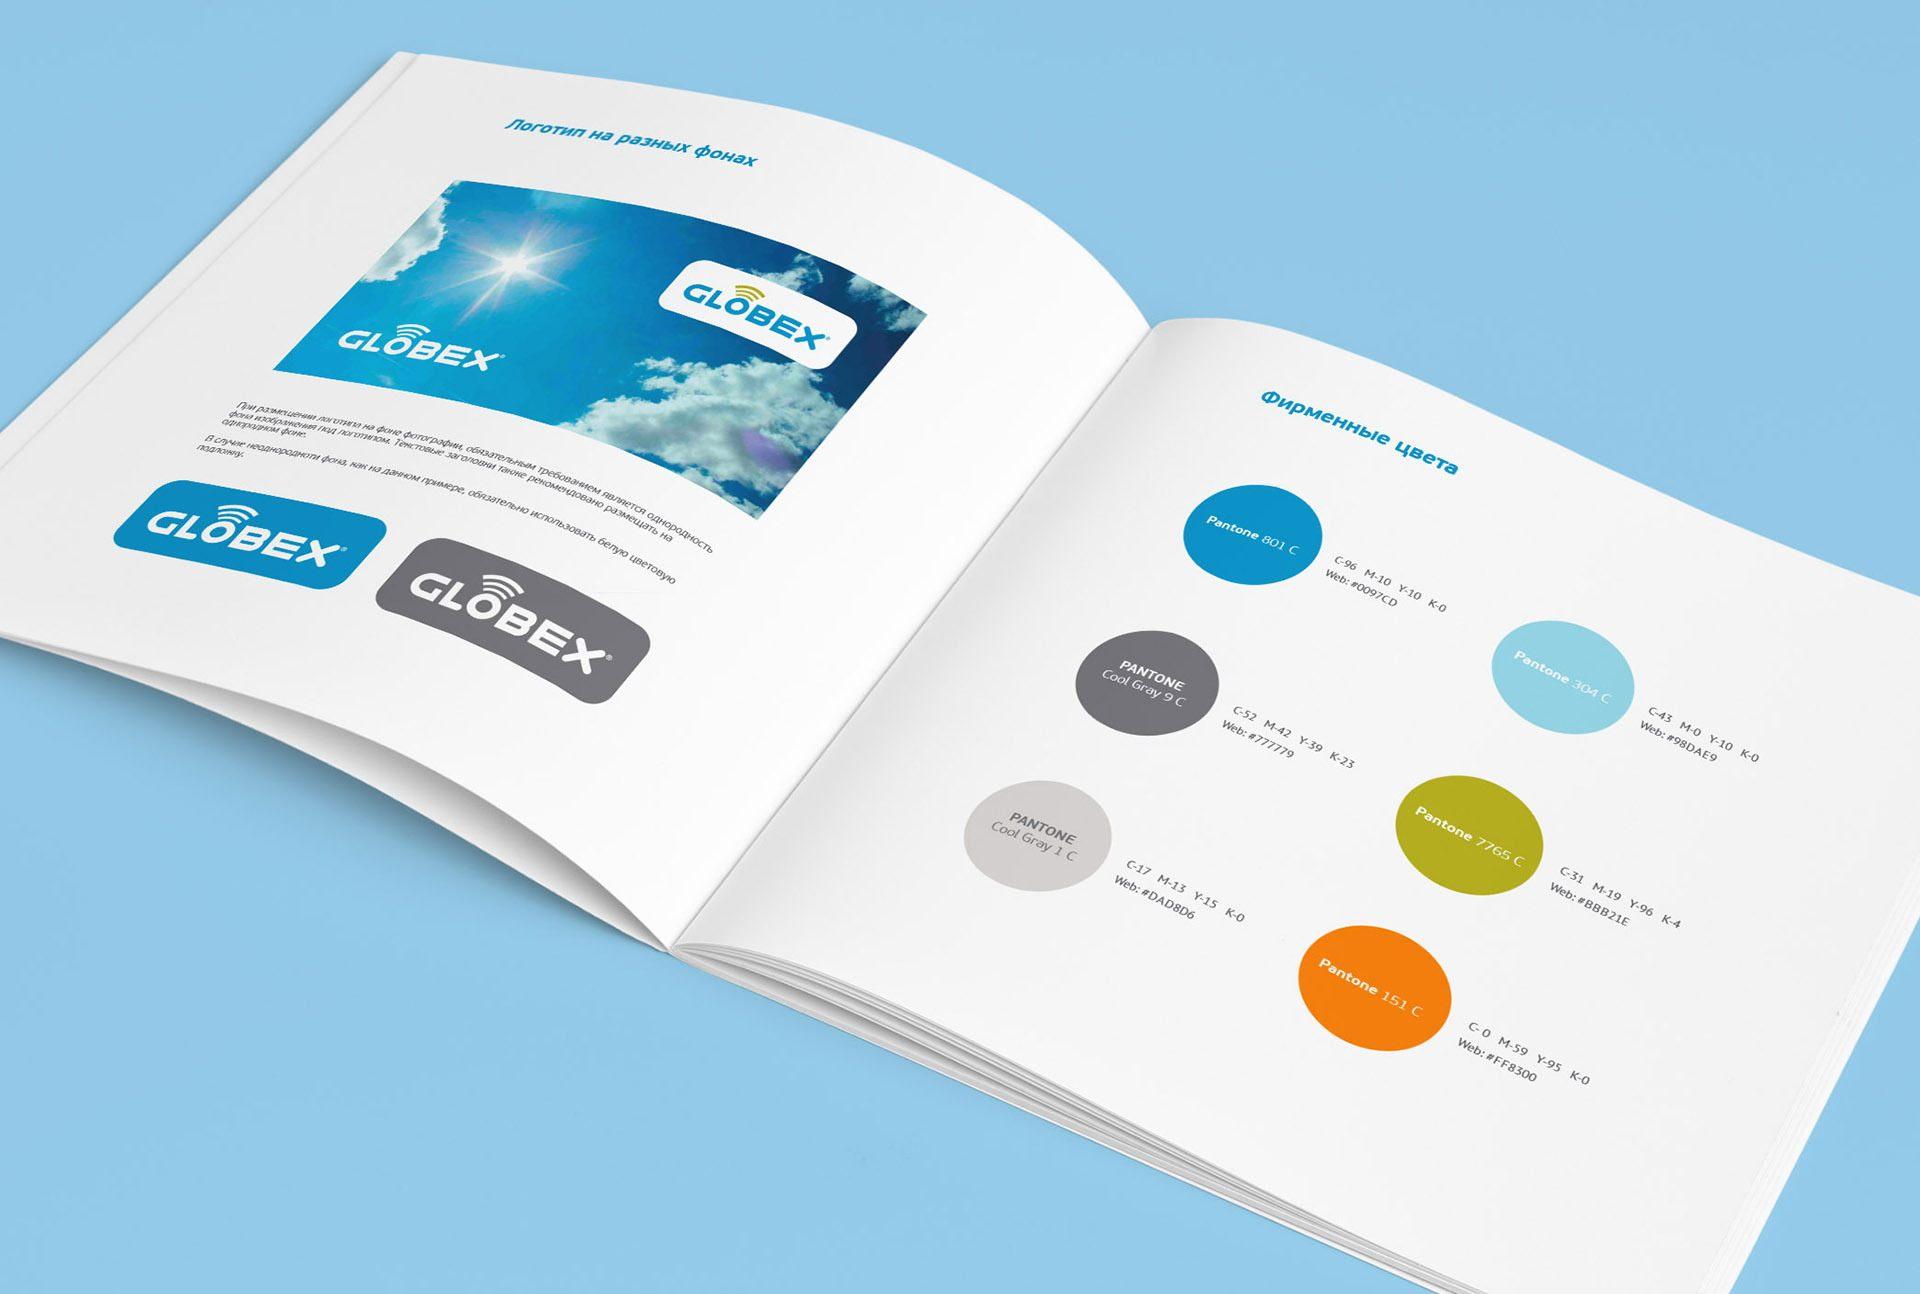 Разработка брендбука IT компании, IT company brandbook